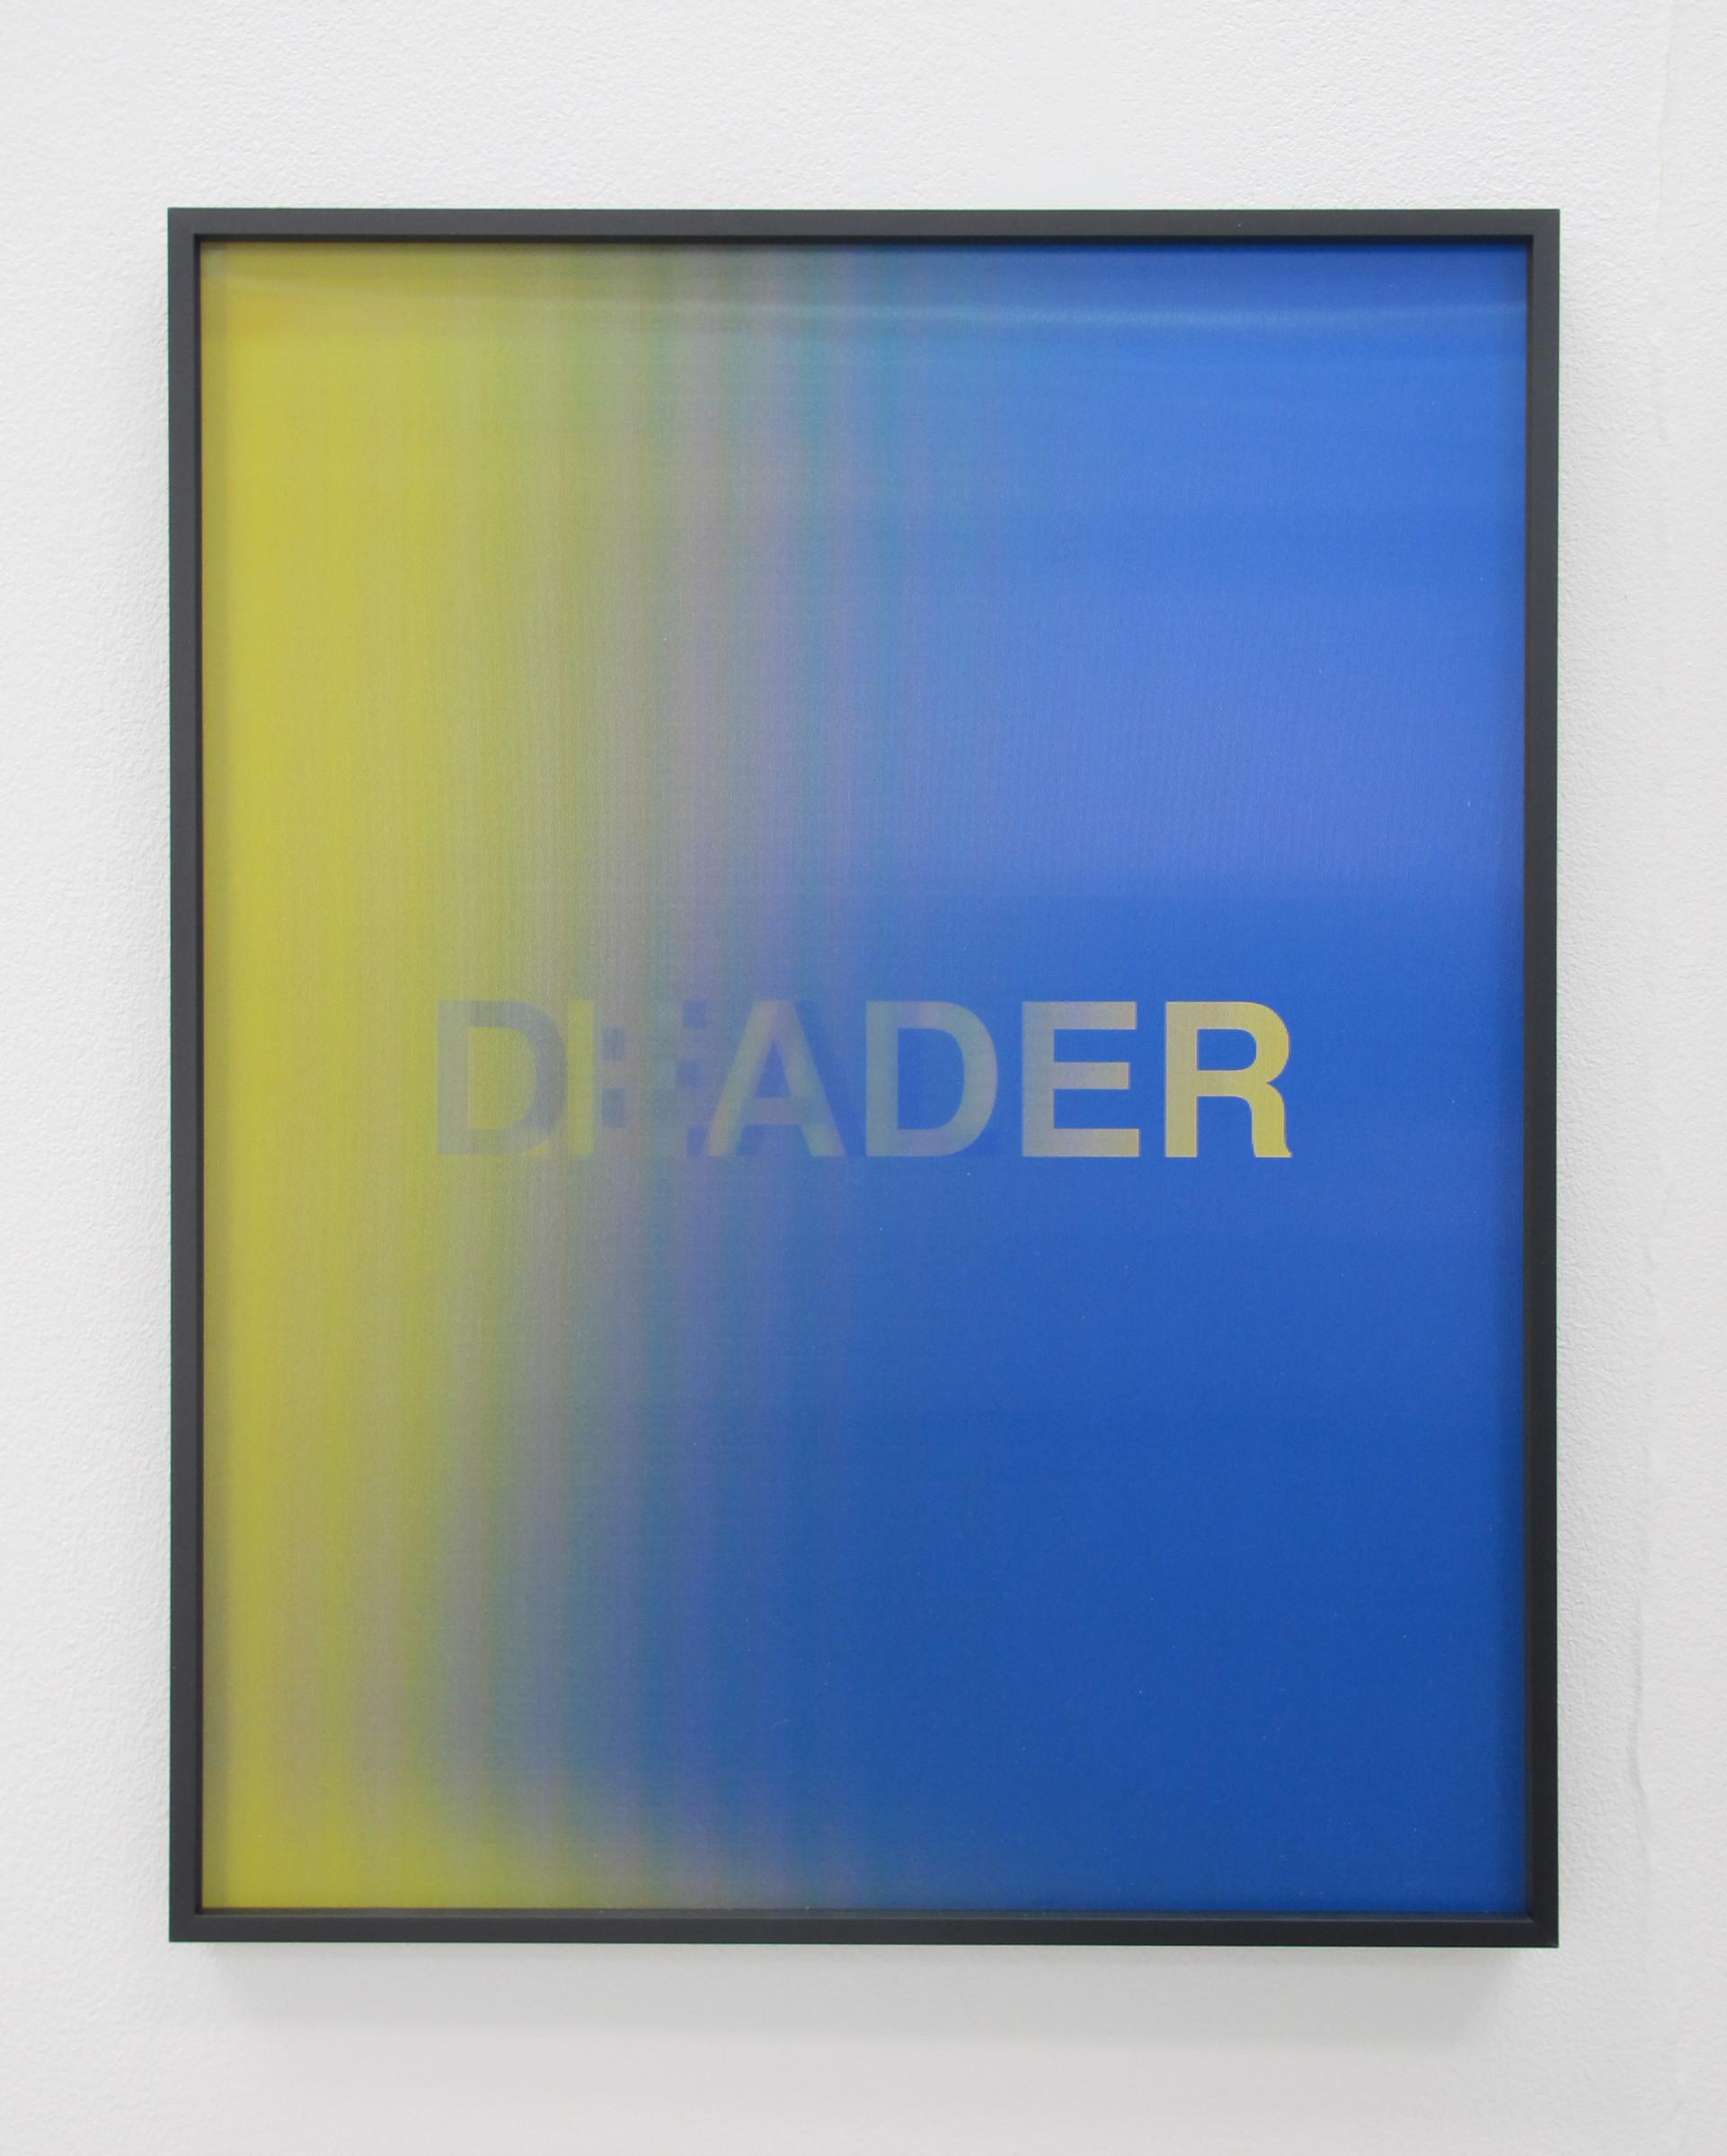 <span class=&#34;link fancybox-details-link&#34;><a href=&#34;/exhibitions/41/works/artworks1575/&#34;>View Detail Page</a></span><div class=&#34;medium&#34;> HD lenticular print</div> <div class=&#34;dimensions&#34;>50 x 40 cm<br /> 19 3/4 x 15 3/4 in</div> <div class=&#34;edition_details&#34;>Edition of 3 + 1 AP</div>